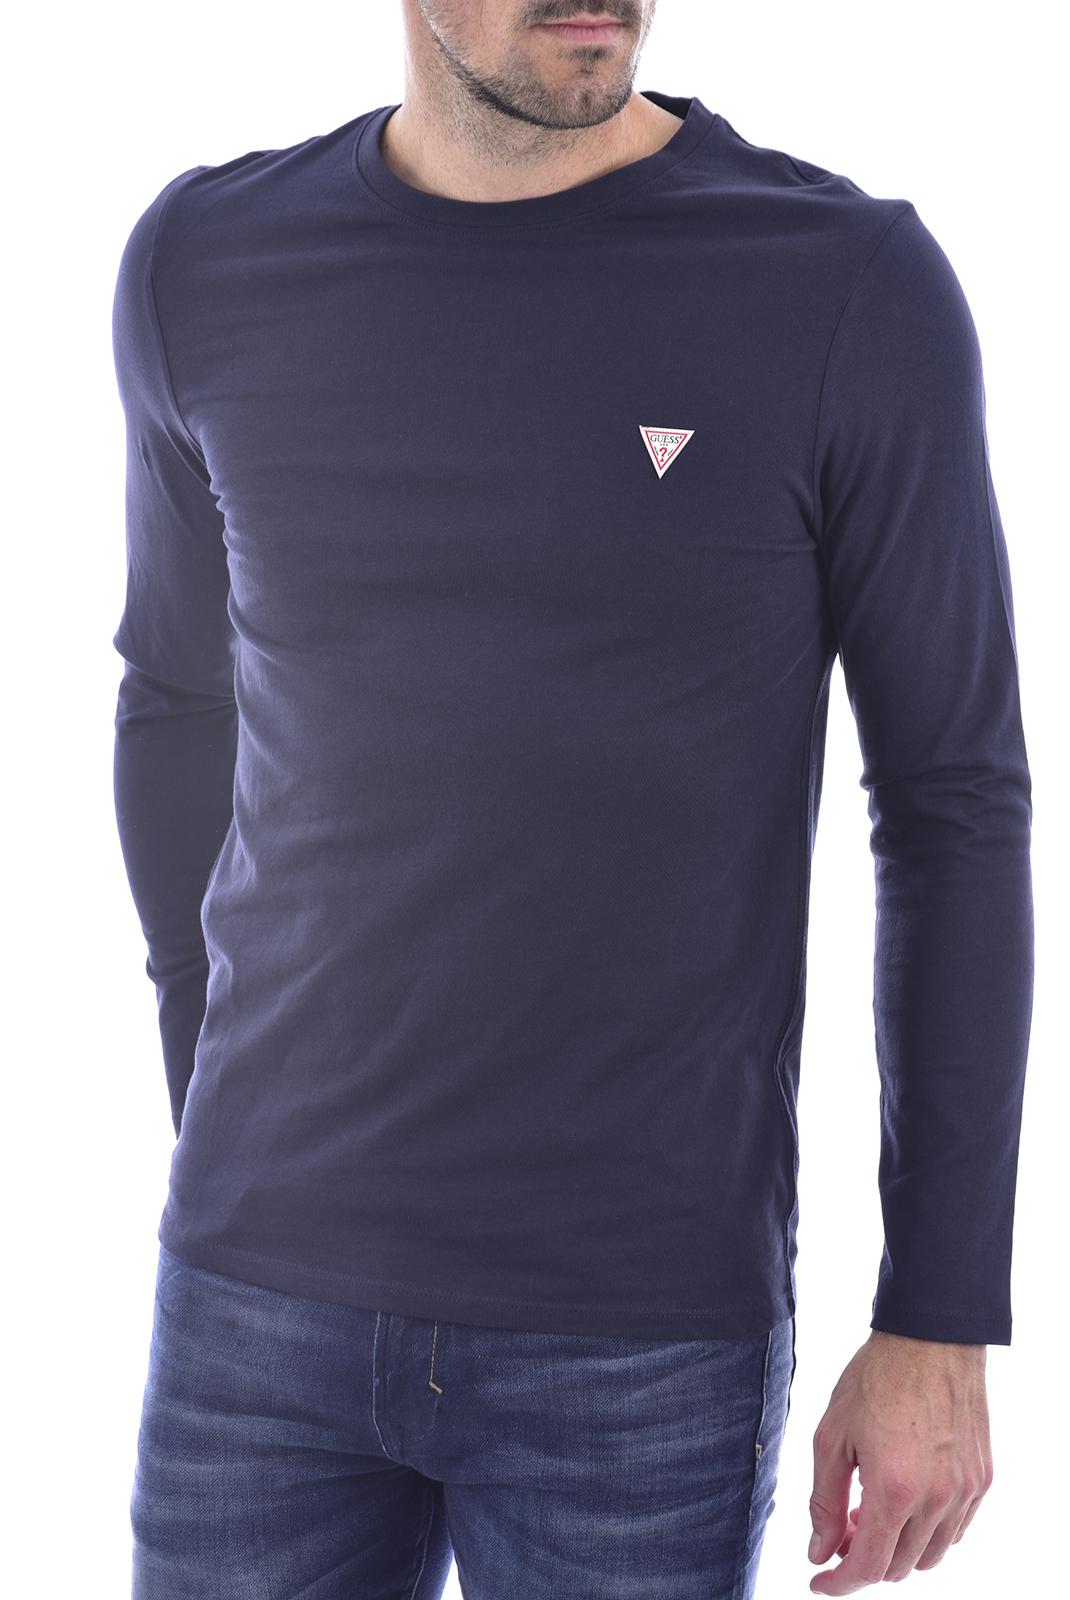 T-S manches longues  Guess jeans M0BI48 I3Z11 G720 bleu